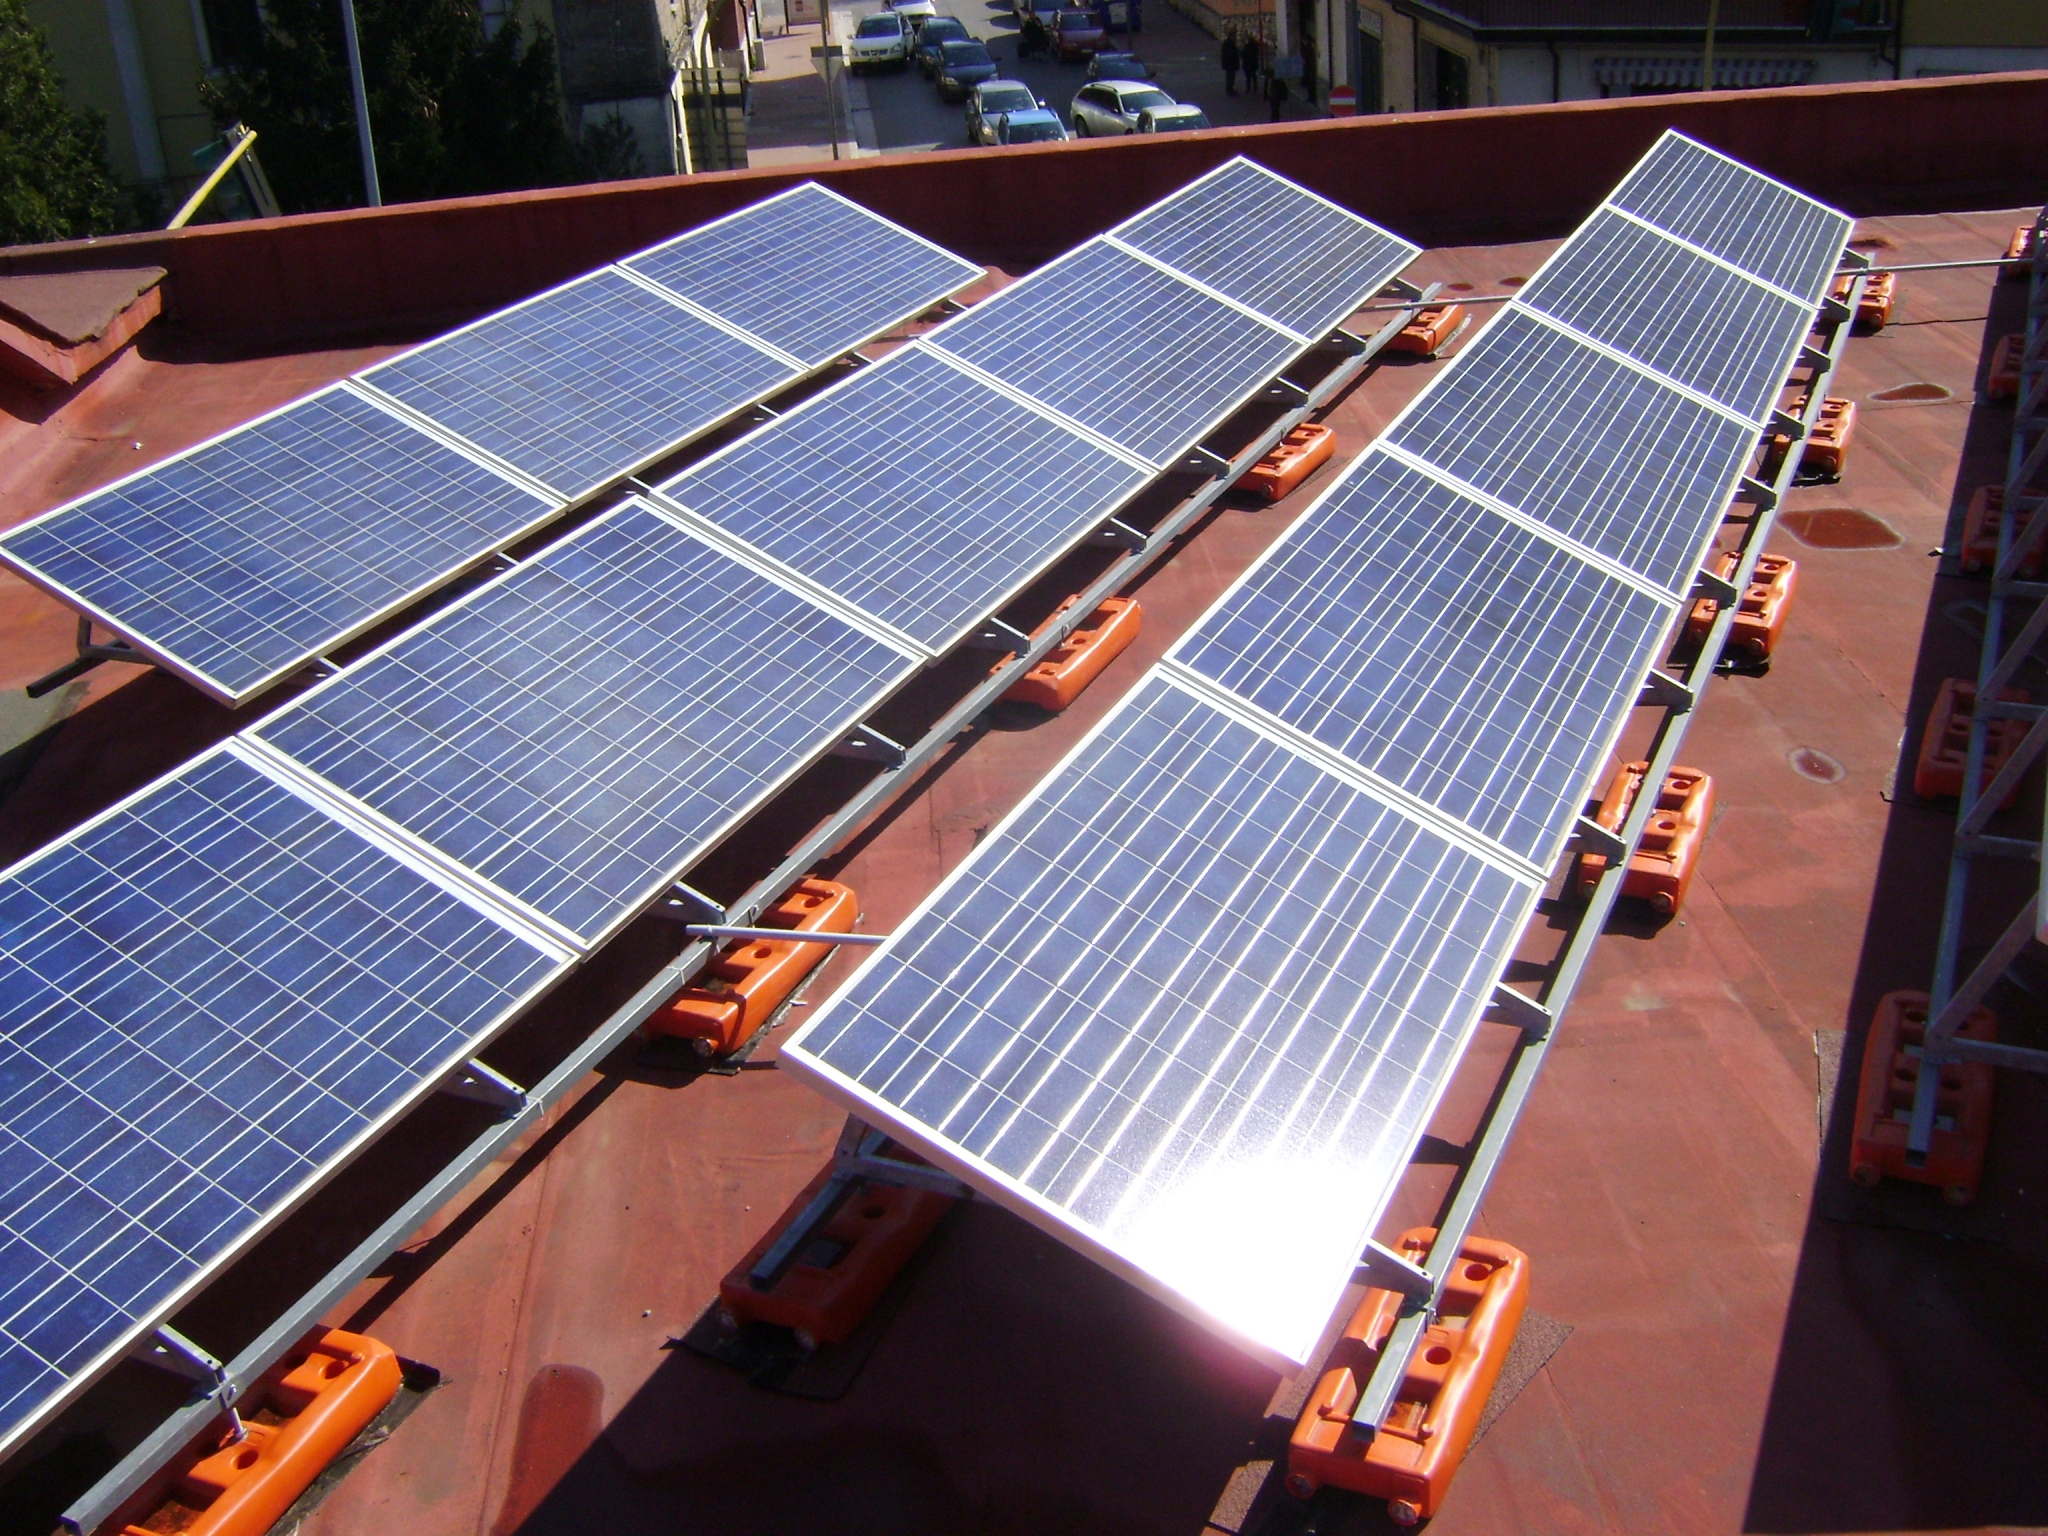 Supporto metallico fotovoltaico